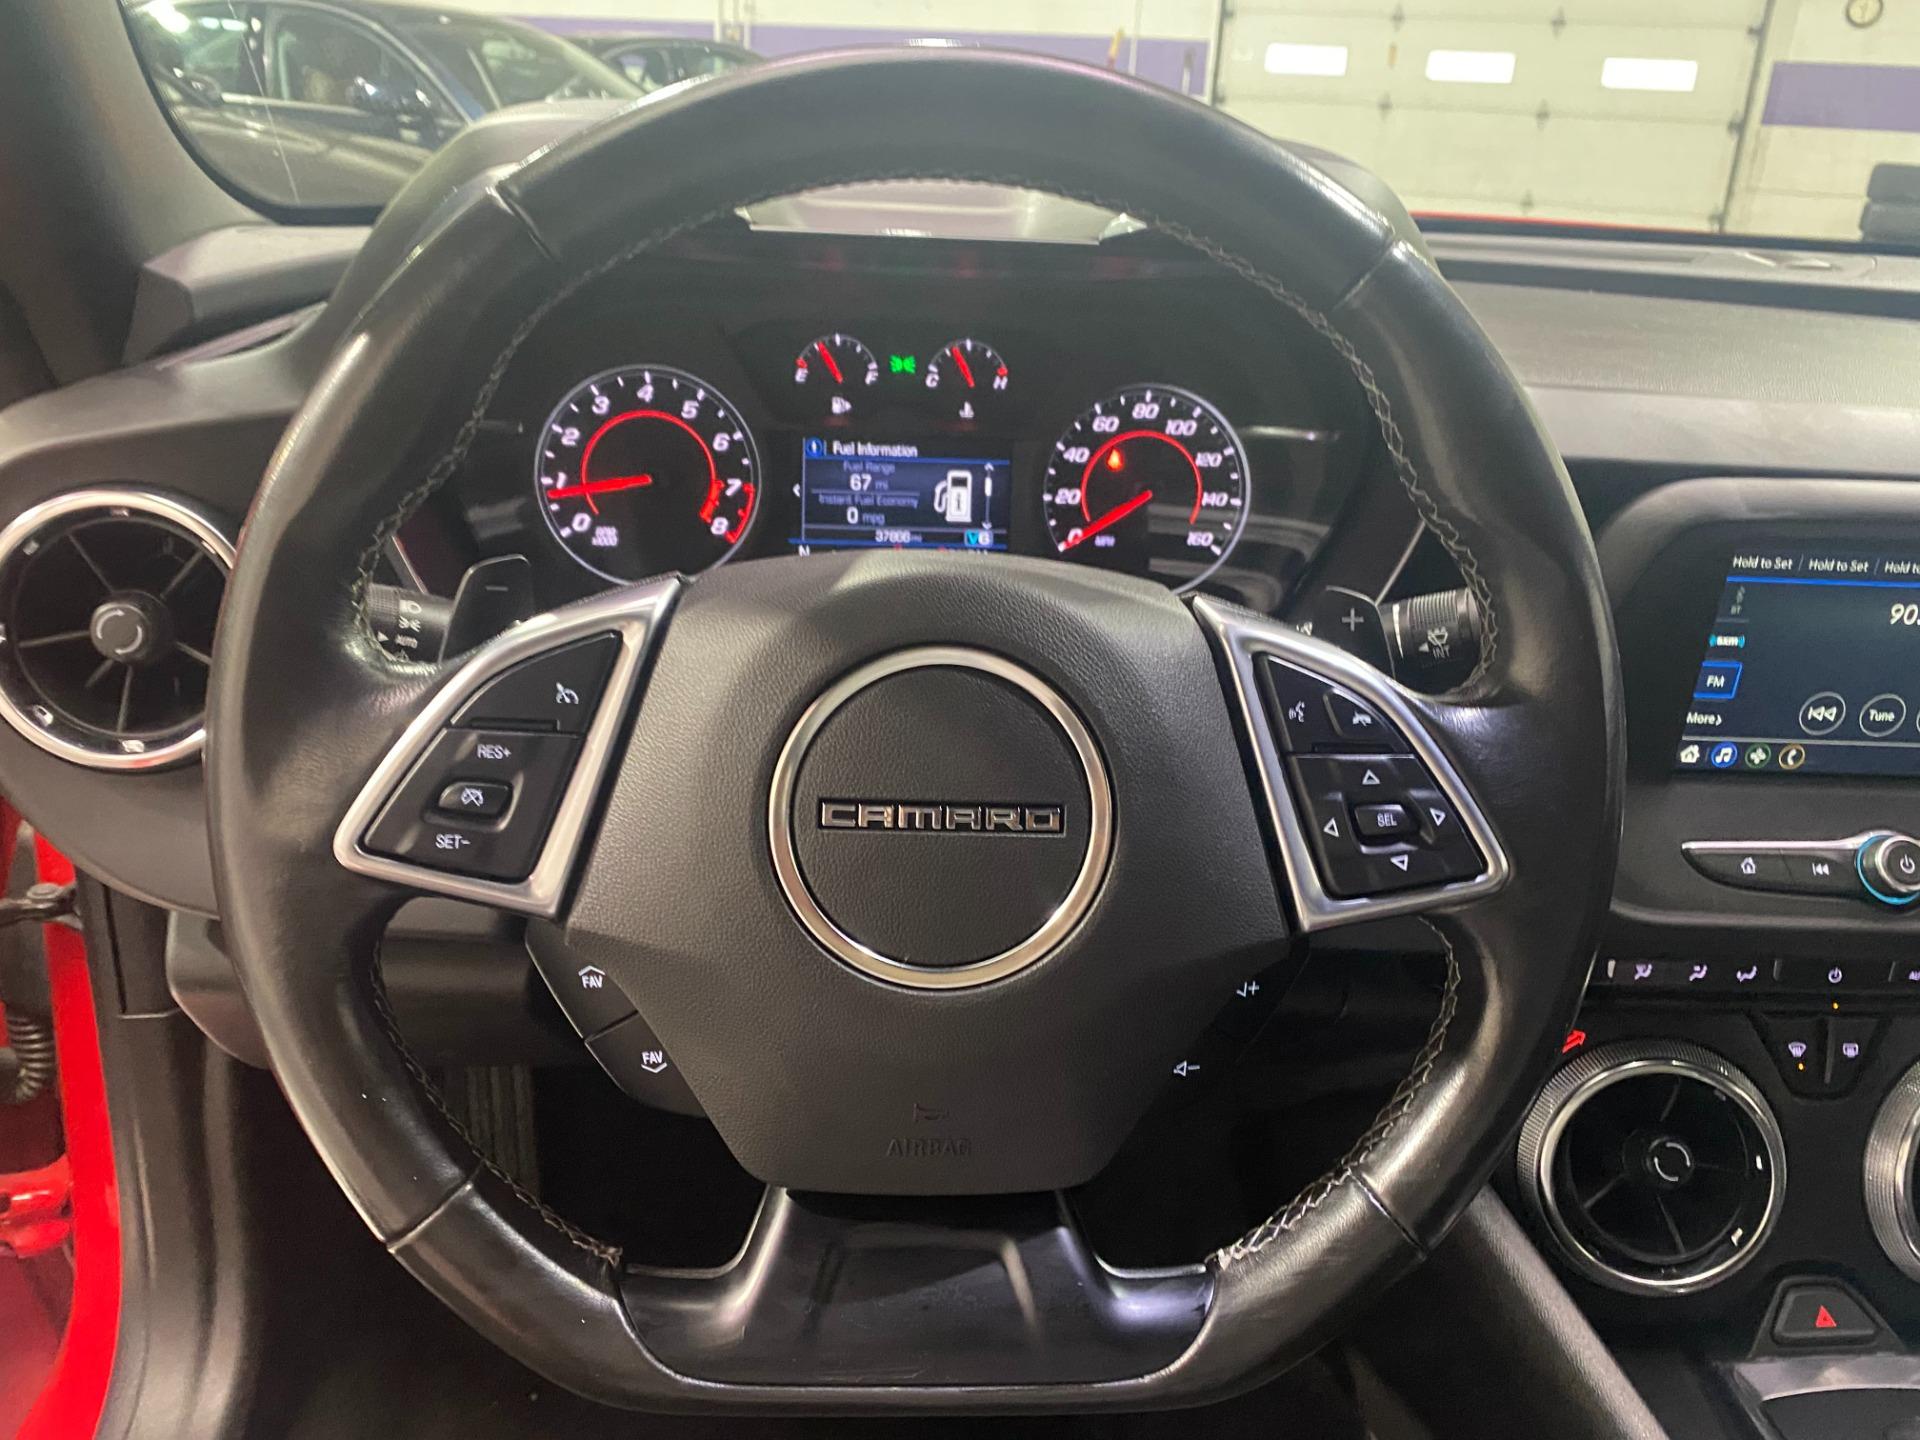 Used-2019-Chevrolet-Camaro-LT-Convertible